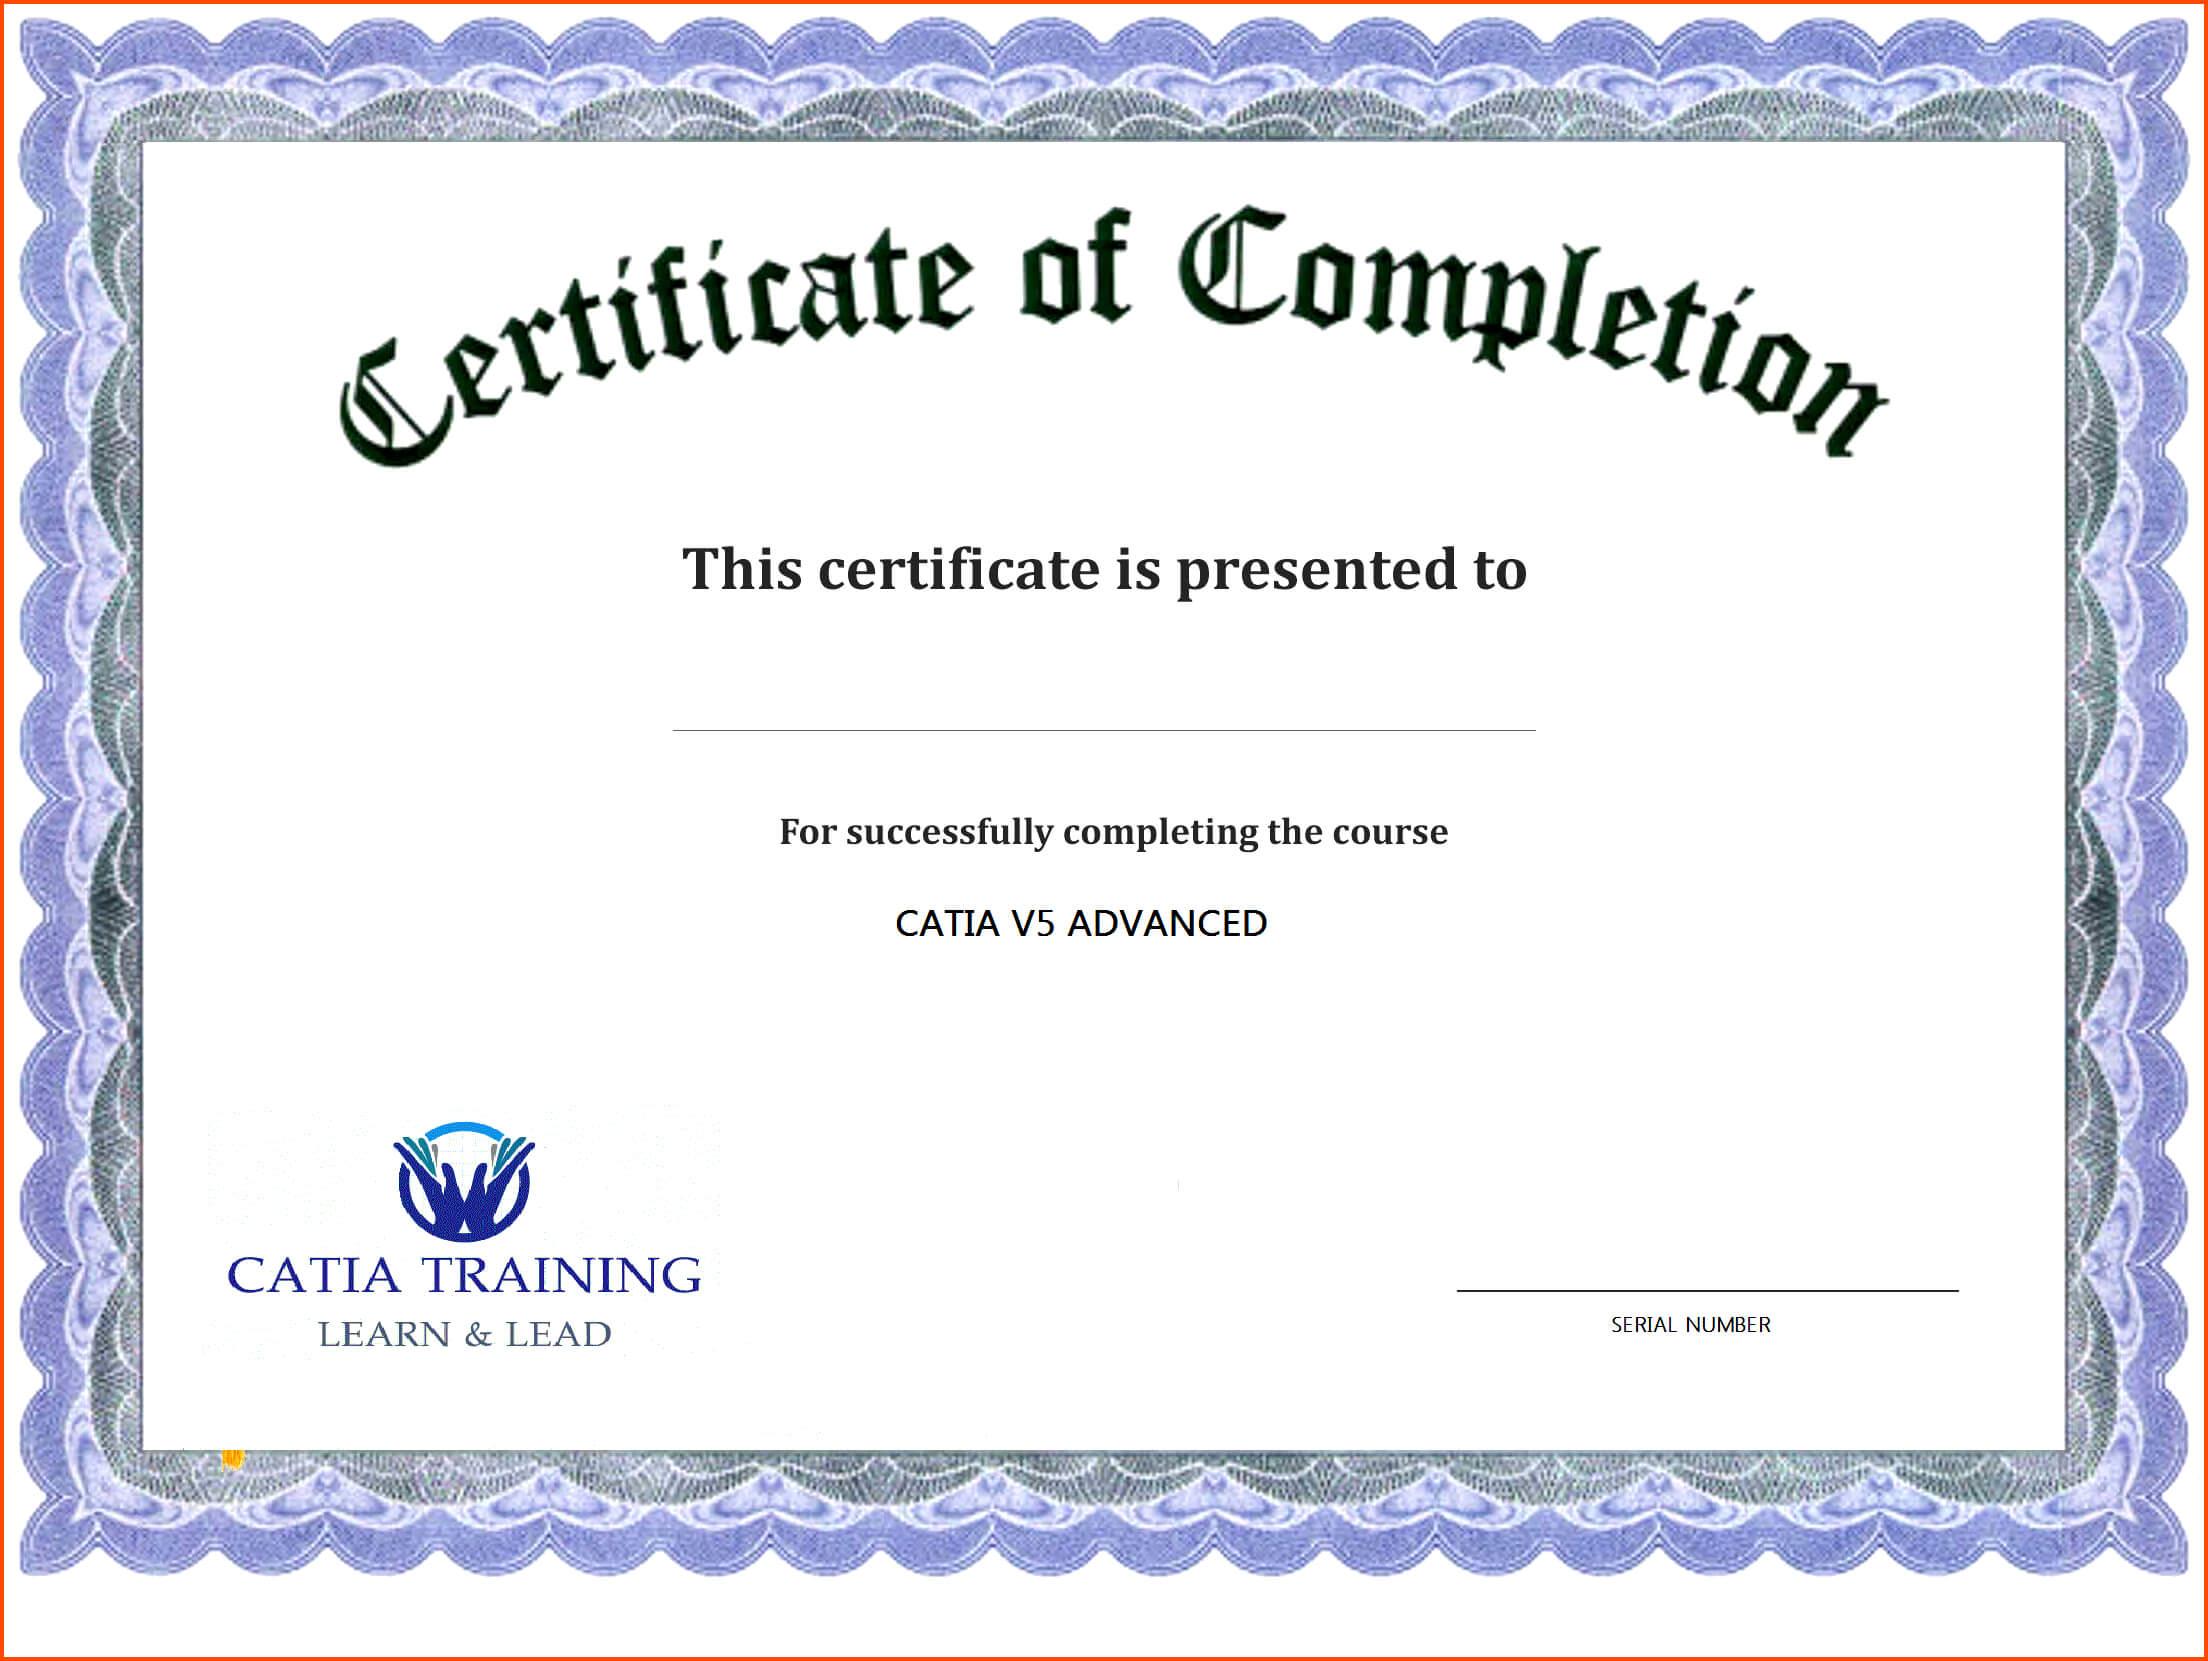 038 Award Certificate Template Word Free Printable Editable Regarding Blank Award Certificate Templates Word